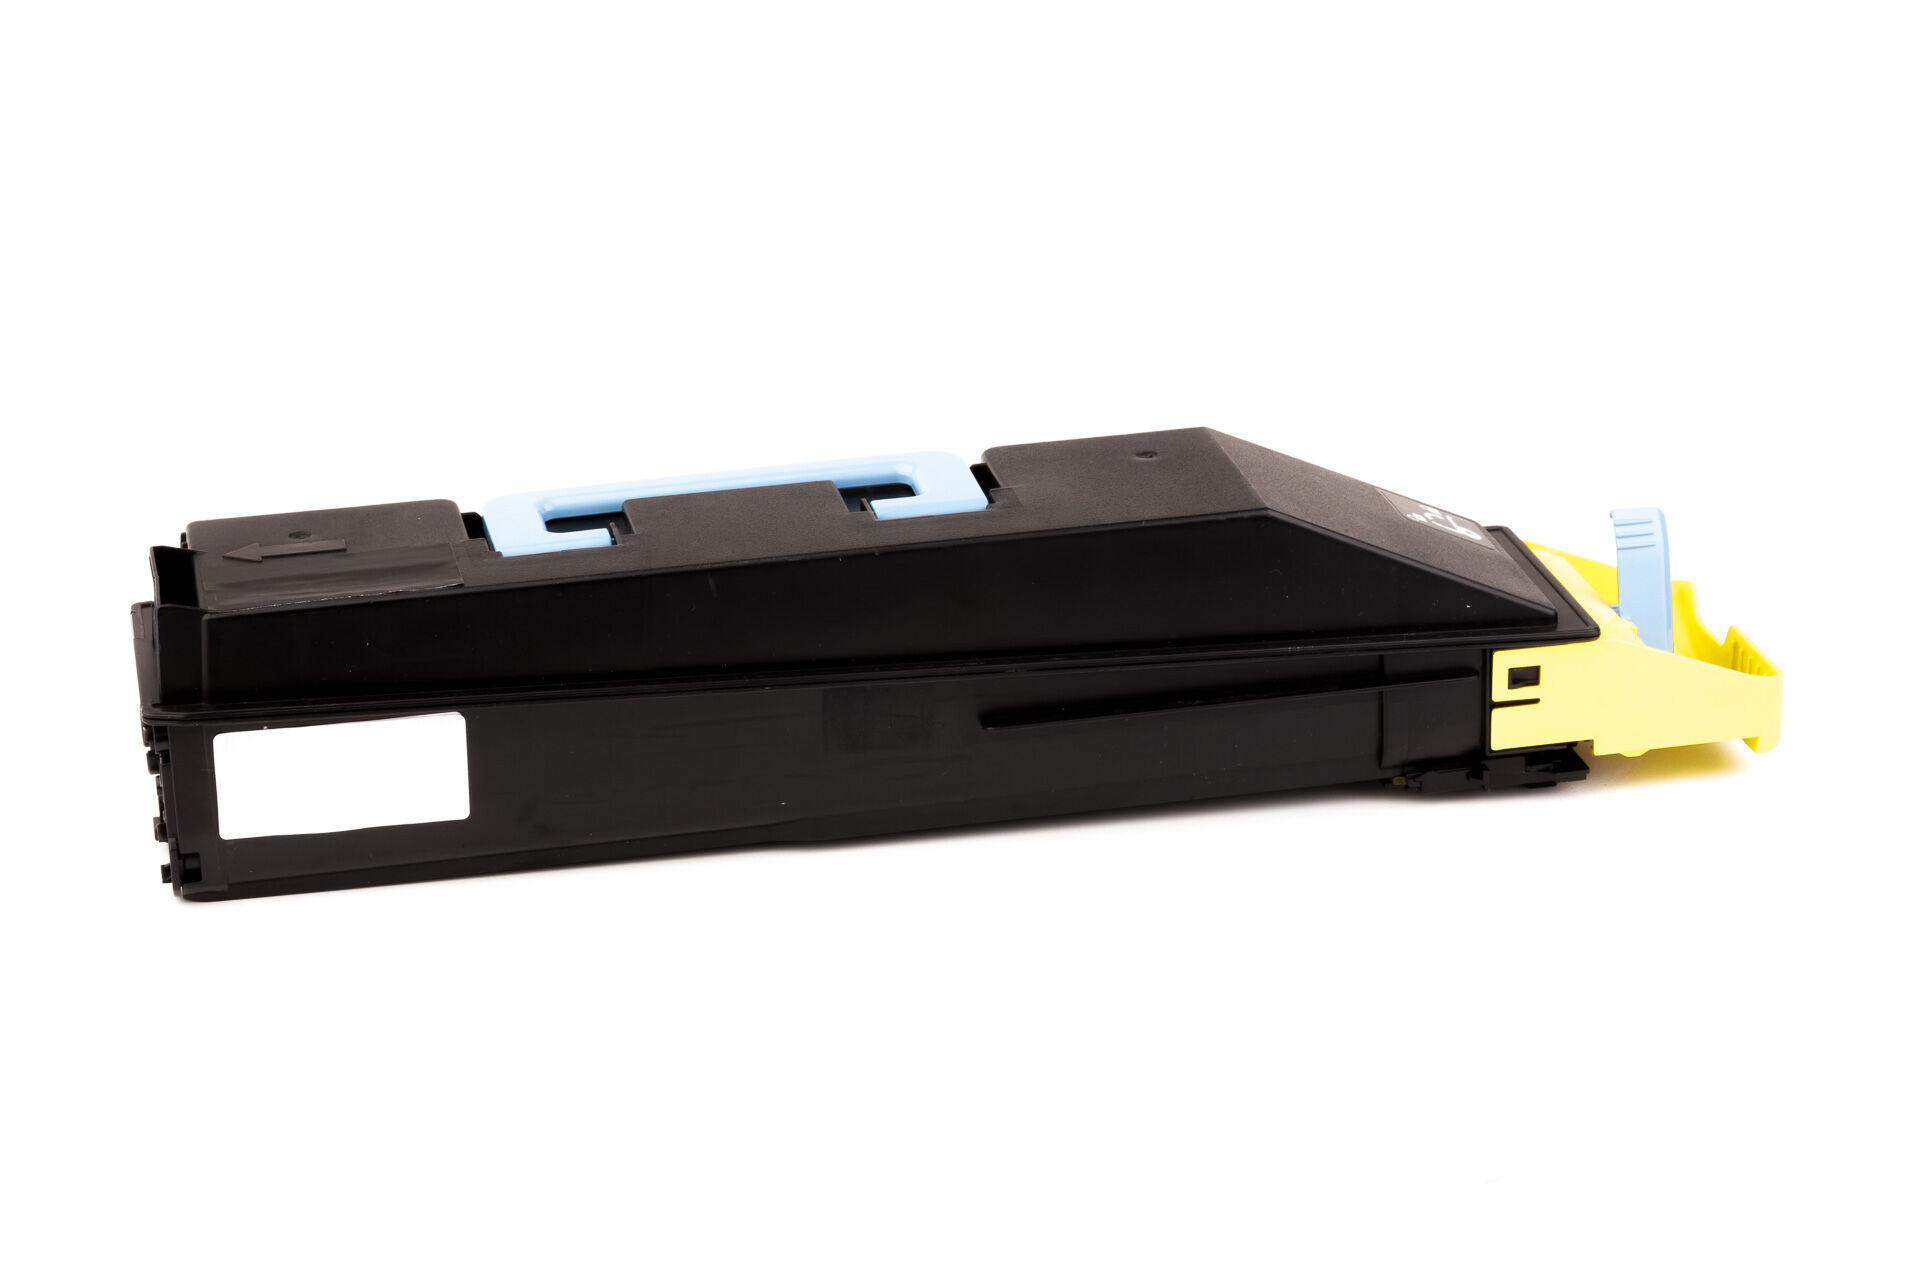 Kyocera Cartouche de Toner pour Kyocera 1T02H7BEU0 / TK-855 M magenta compatible (de marque ASC)